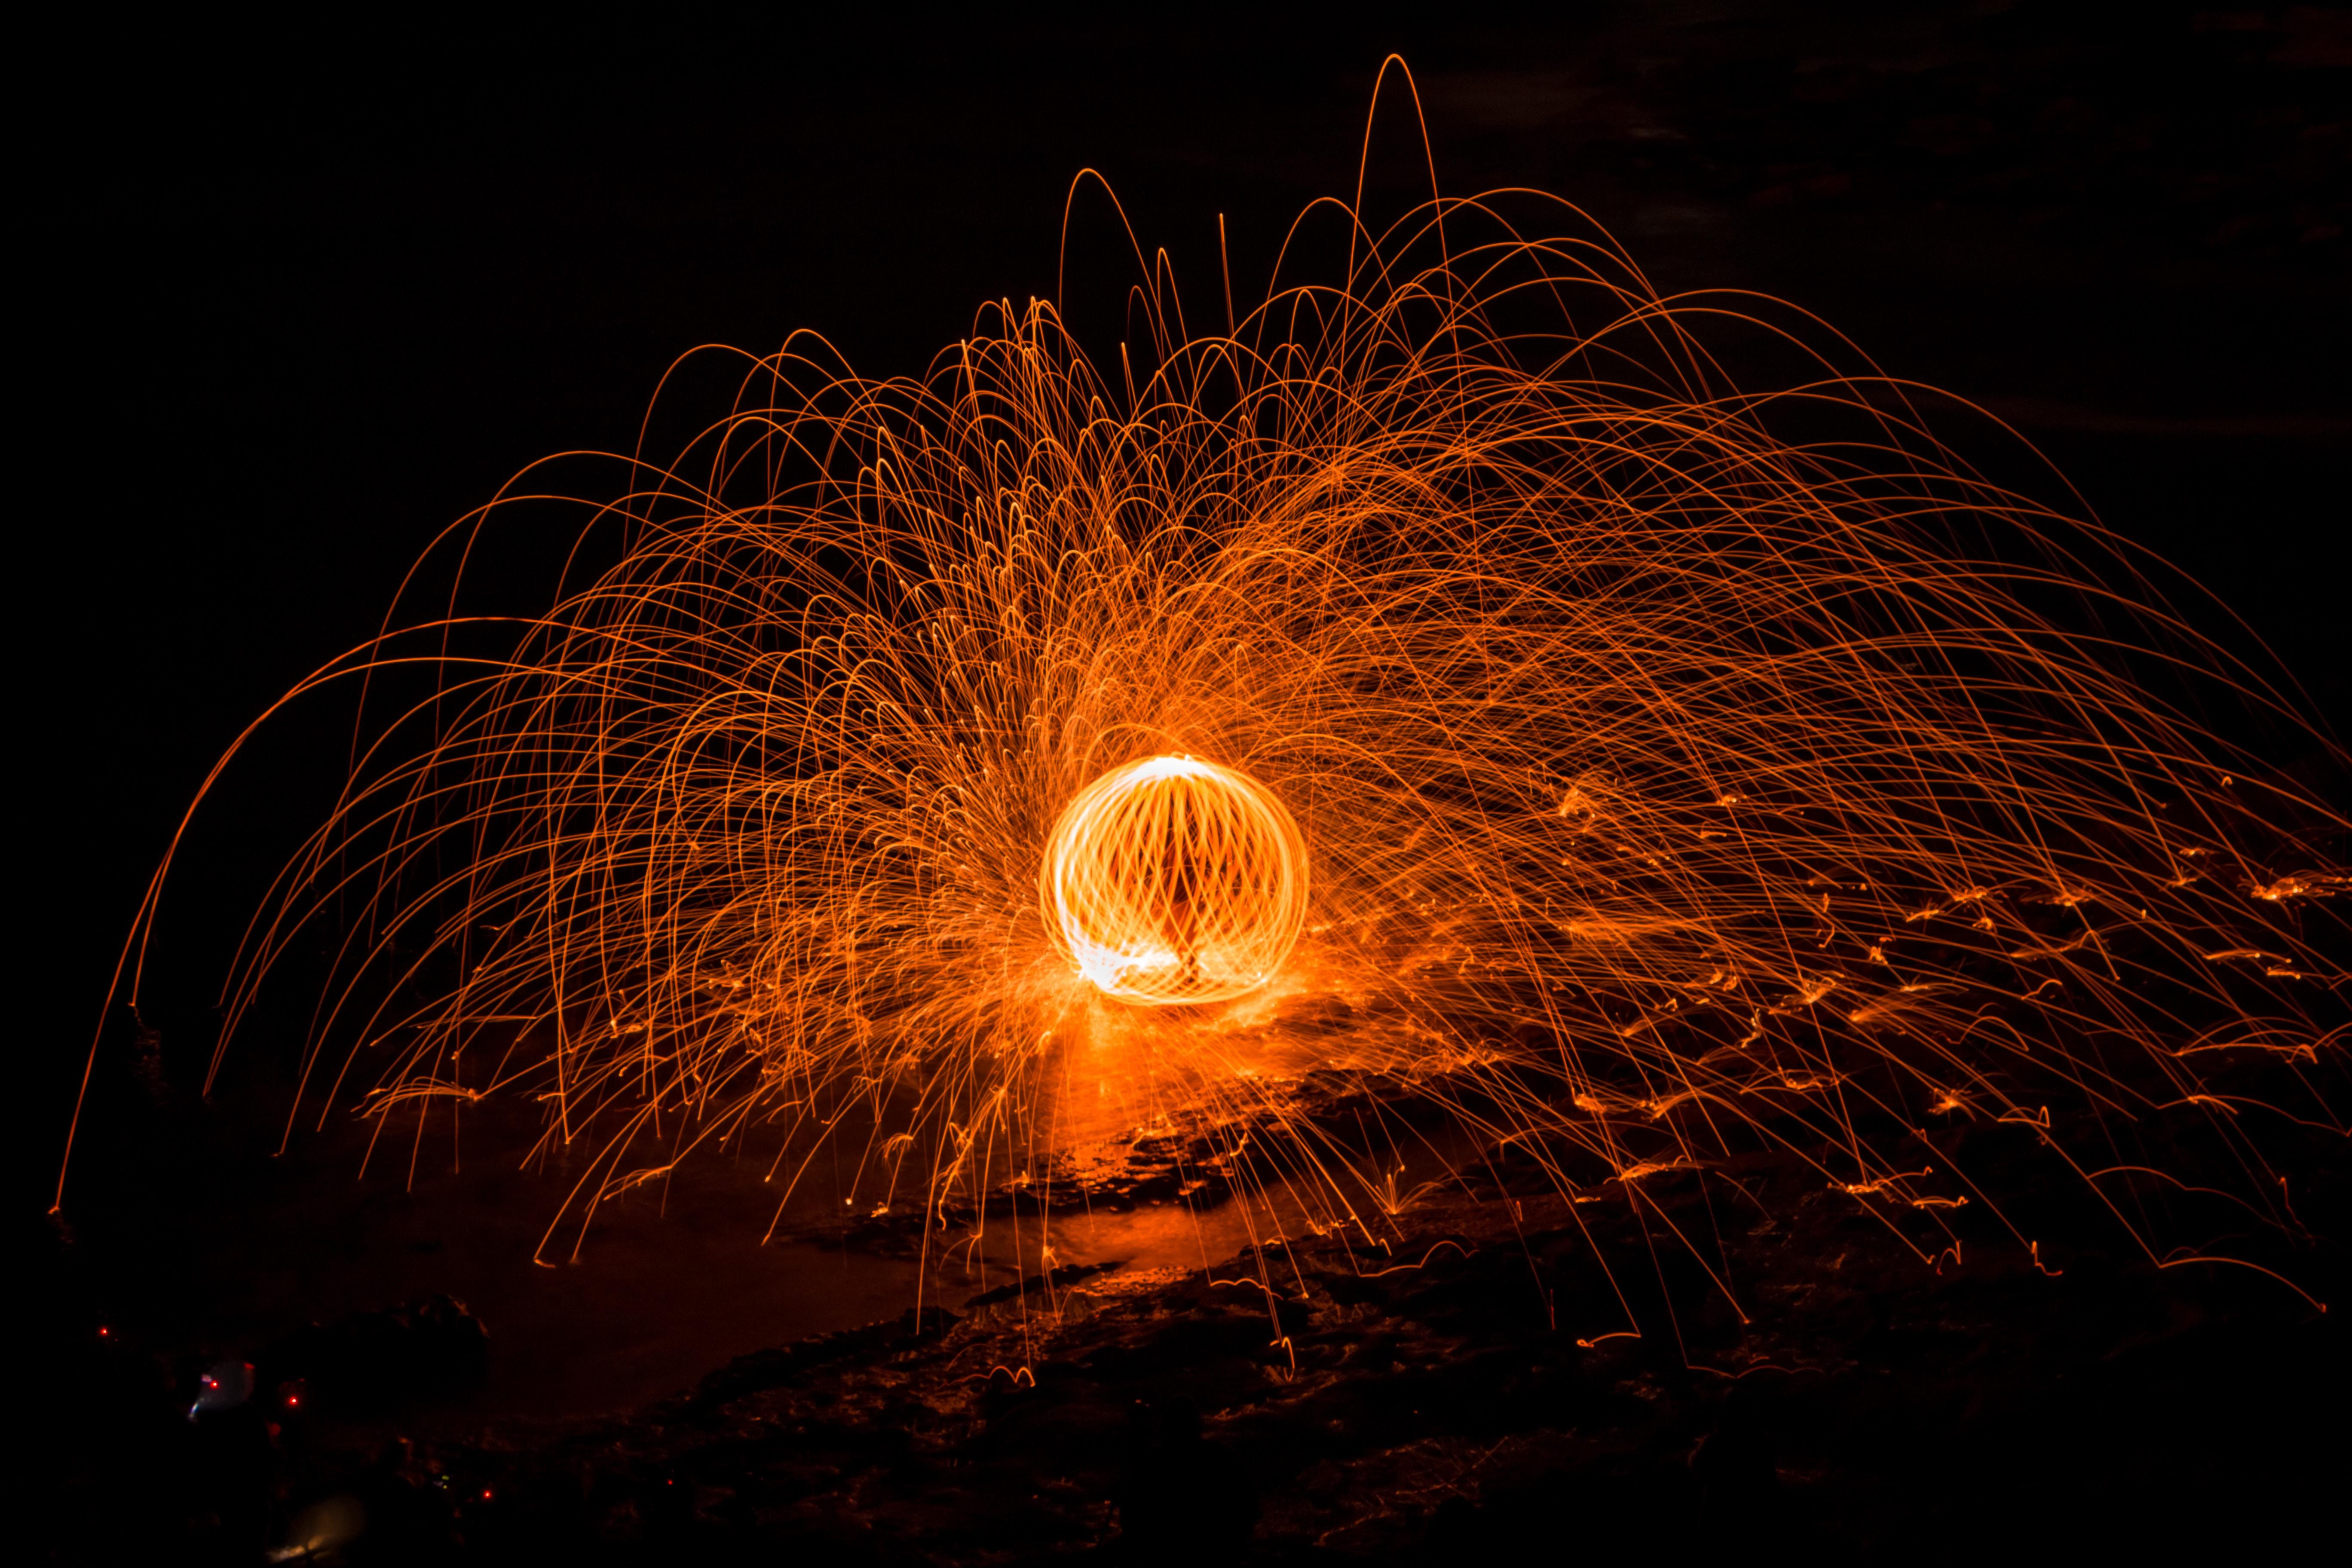 steelwool photography